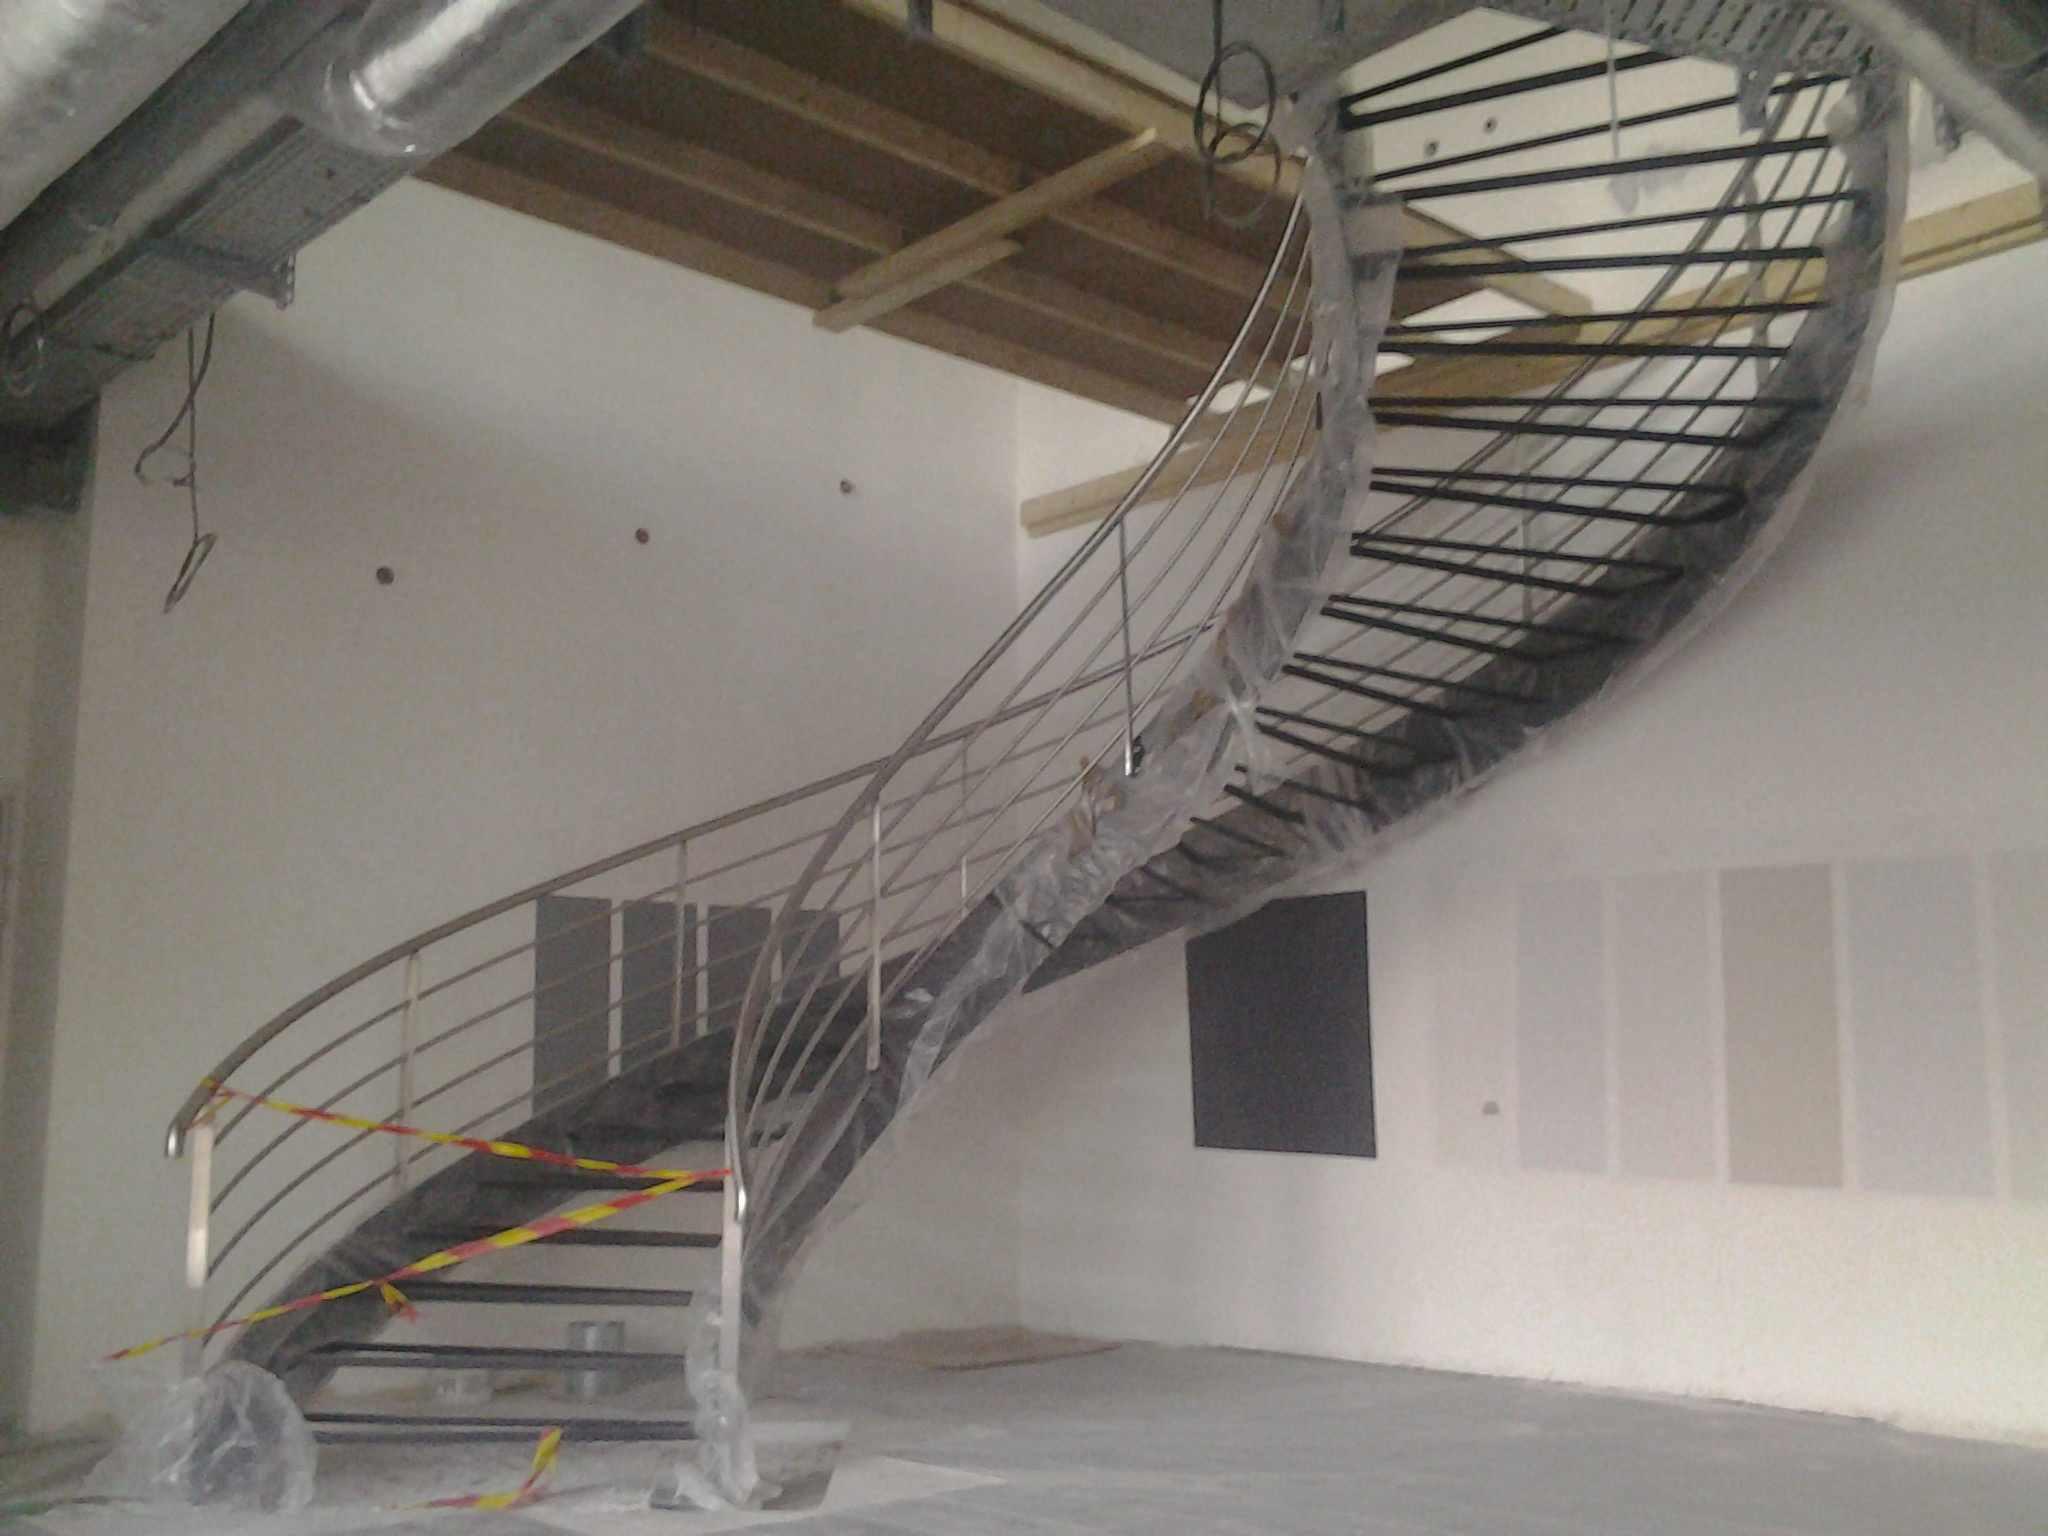 Faire fabriquer et installer des escaliers sg concept - Escalier debillarde ...